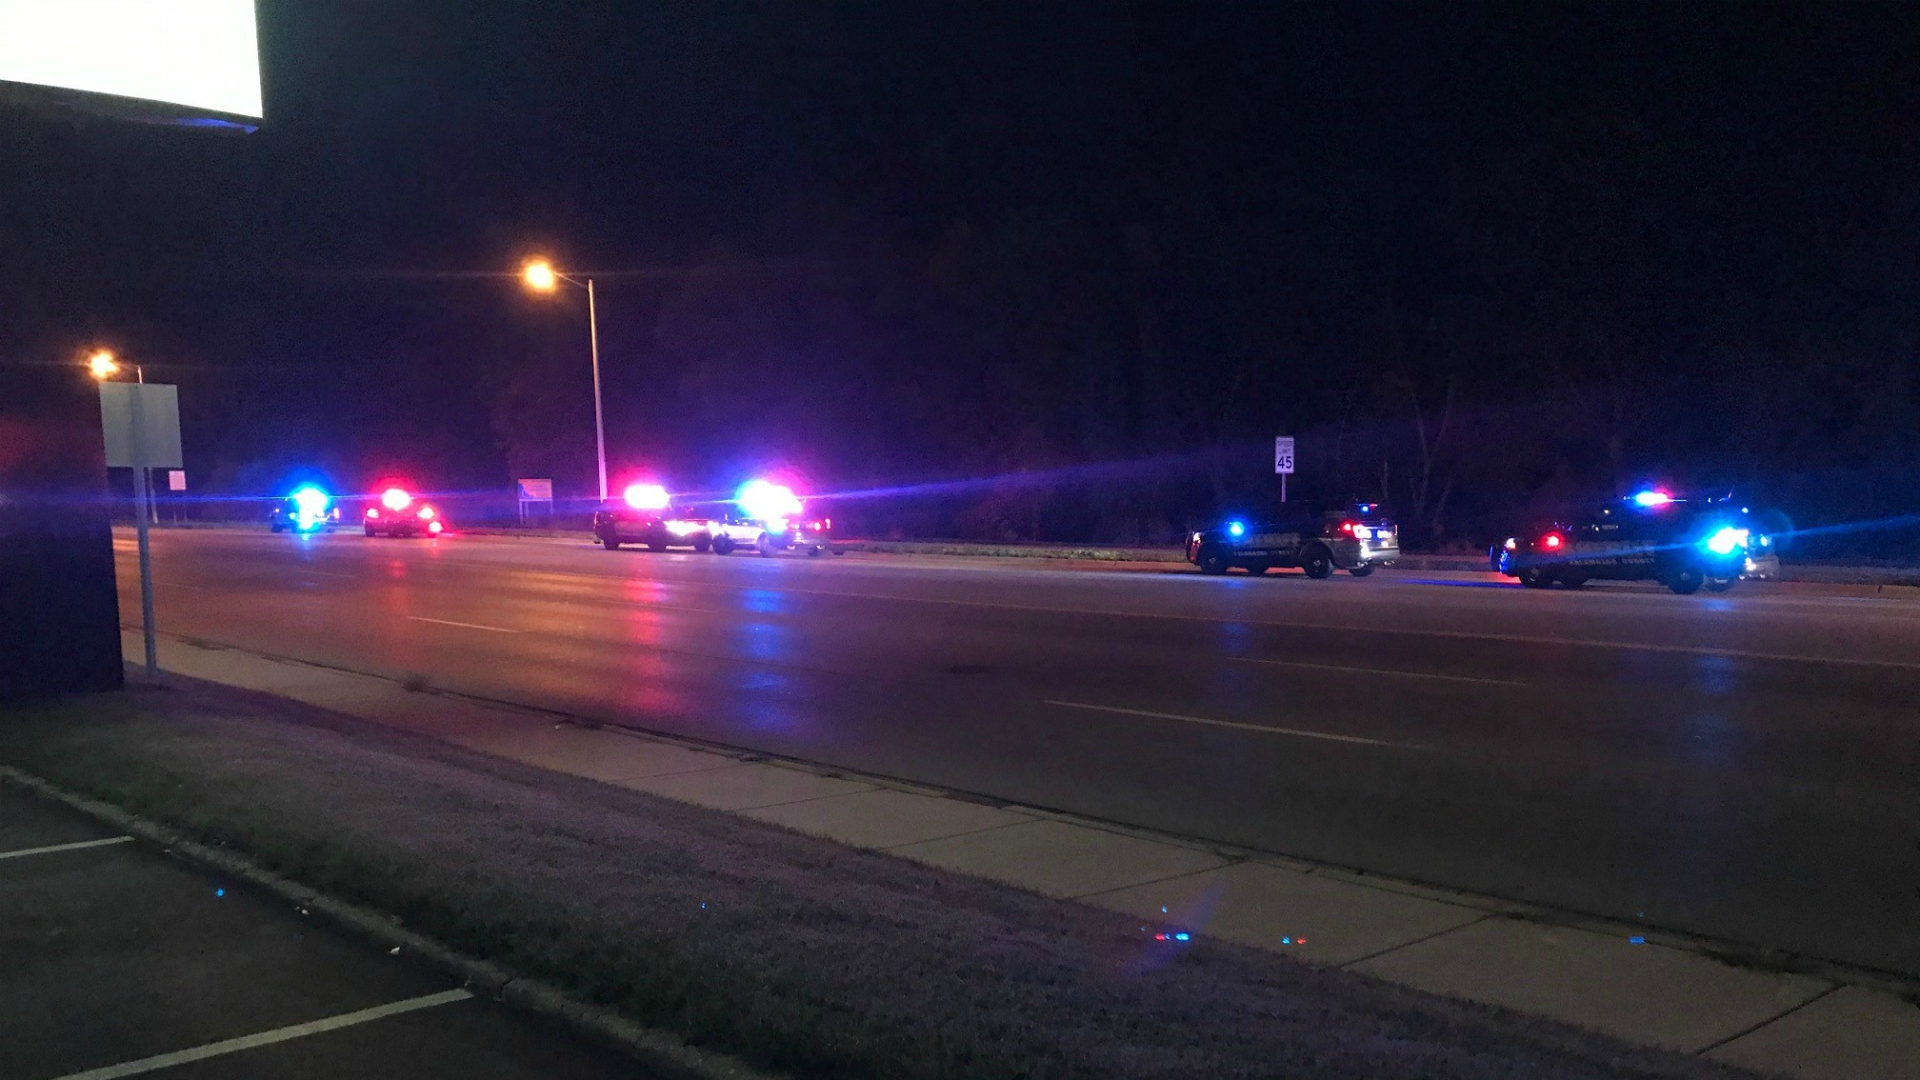 Kalamazoo Drake Road and Stadium Drive police response